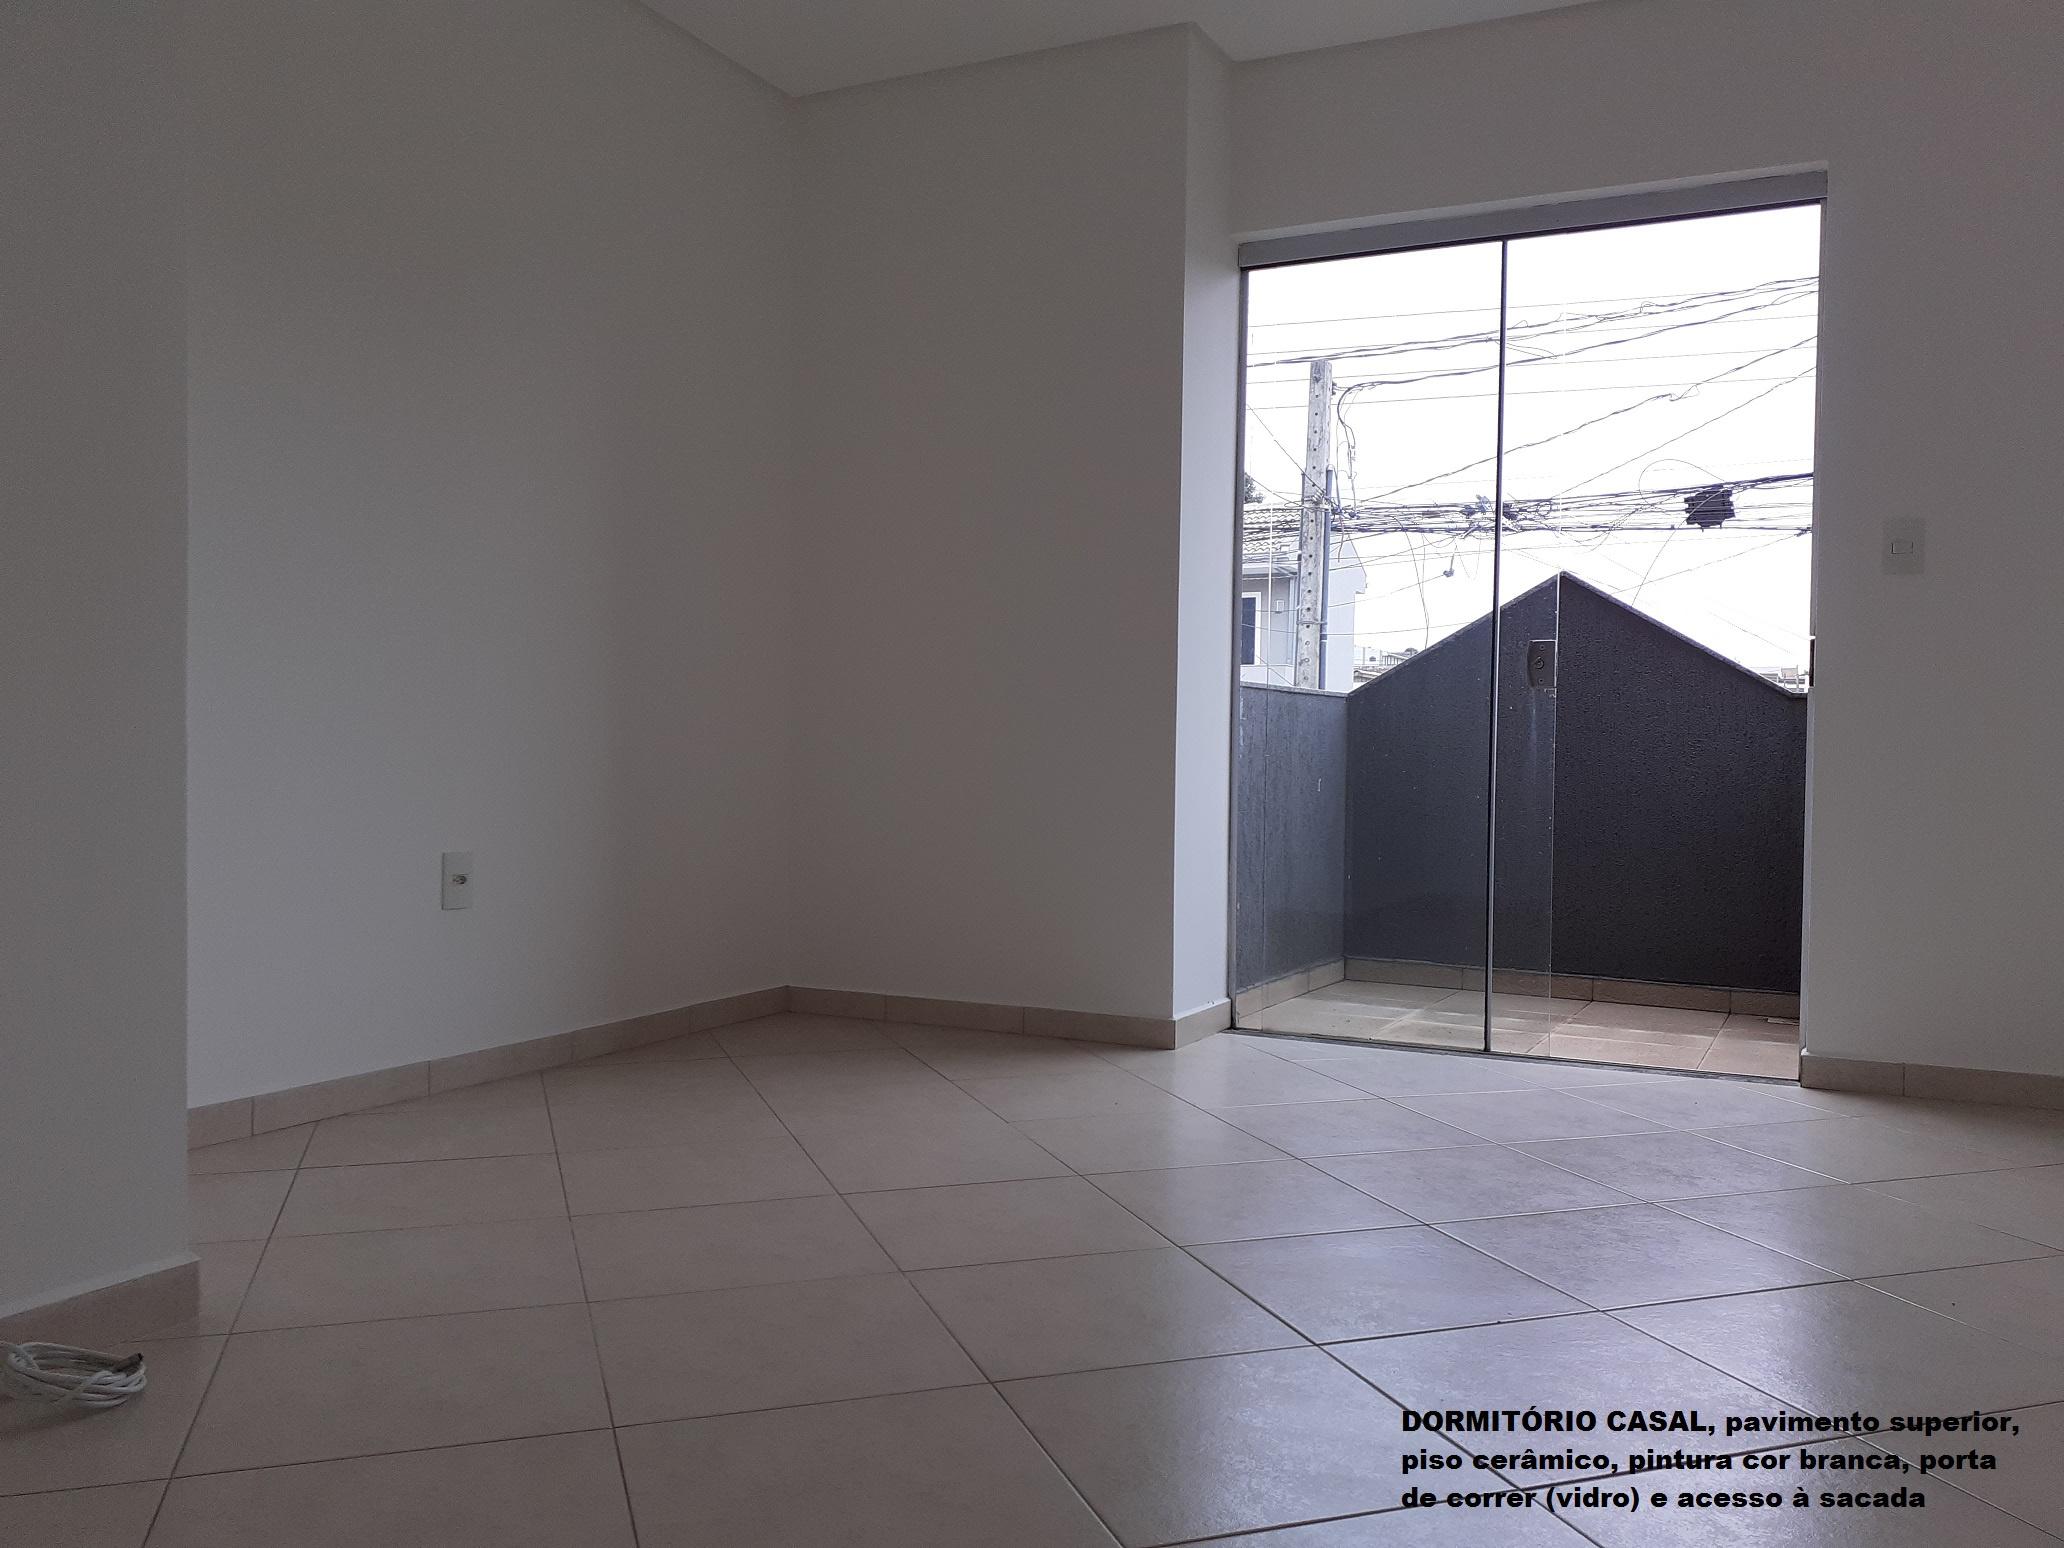 https://0201.nccdn.net/4_2/000/000/011/751/017-dormit--rio-casal-_-piso-superior-2064x1548.jpg